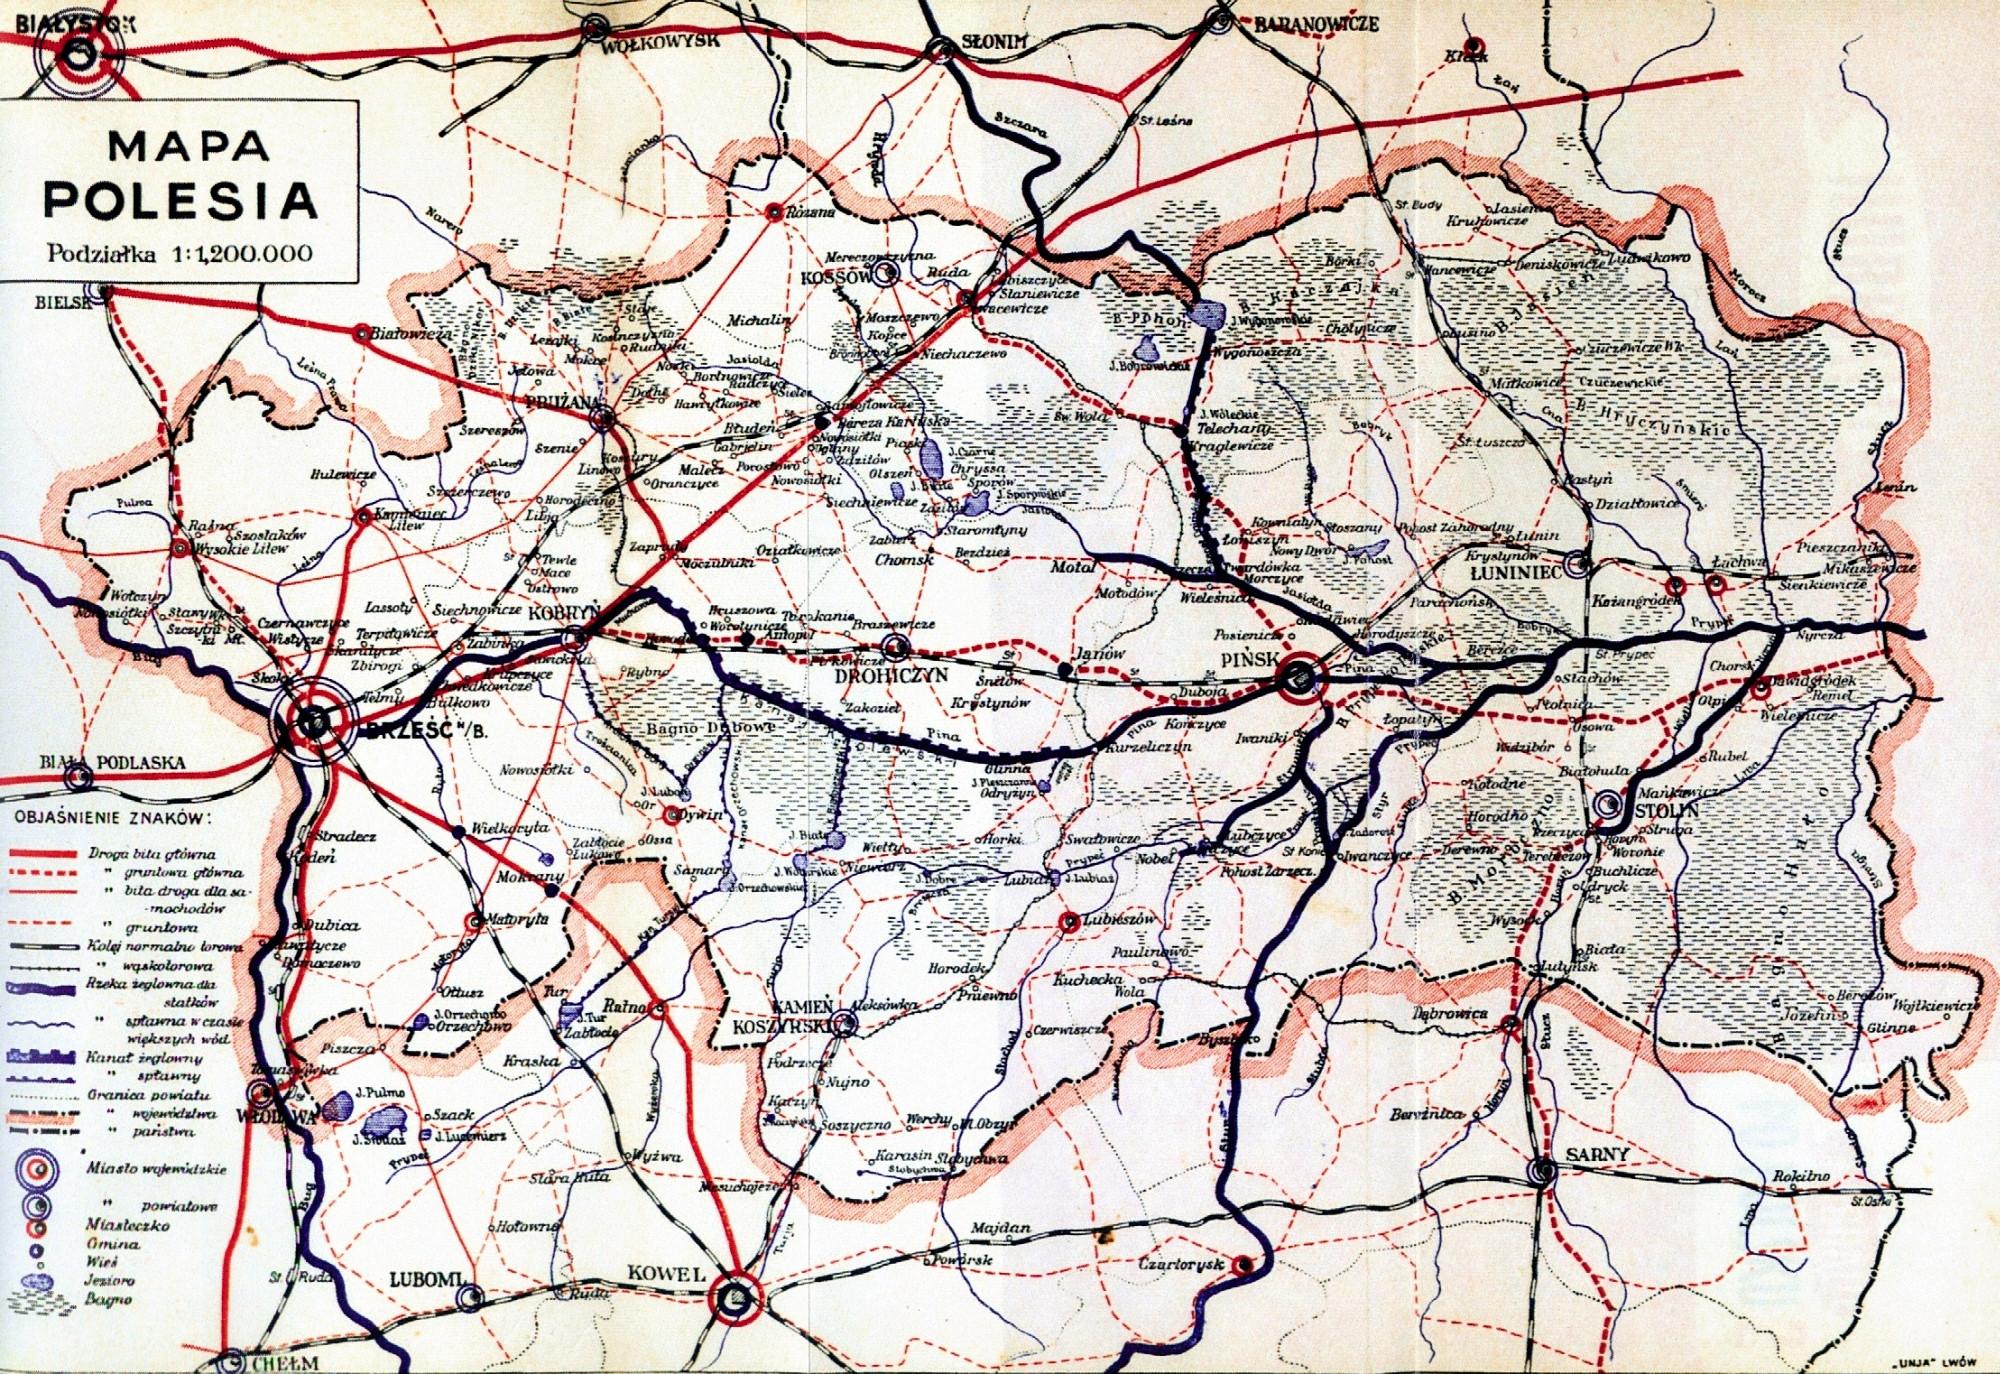 mapa_polesia_Marczak